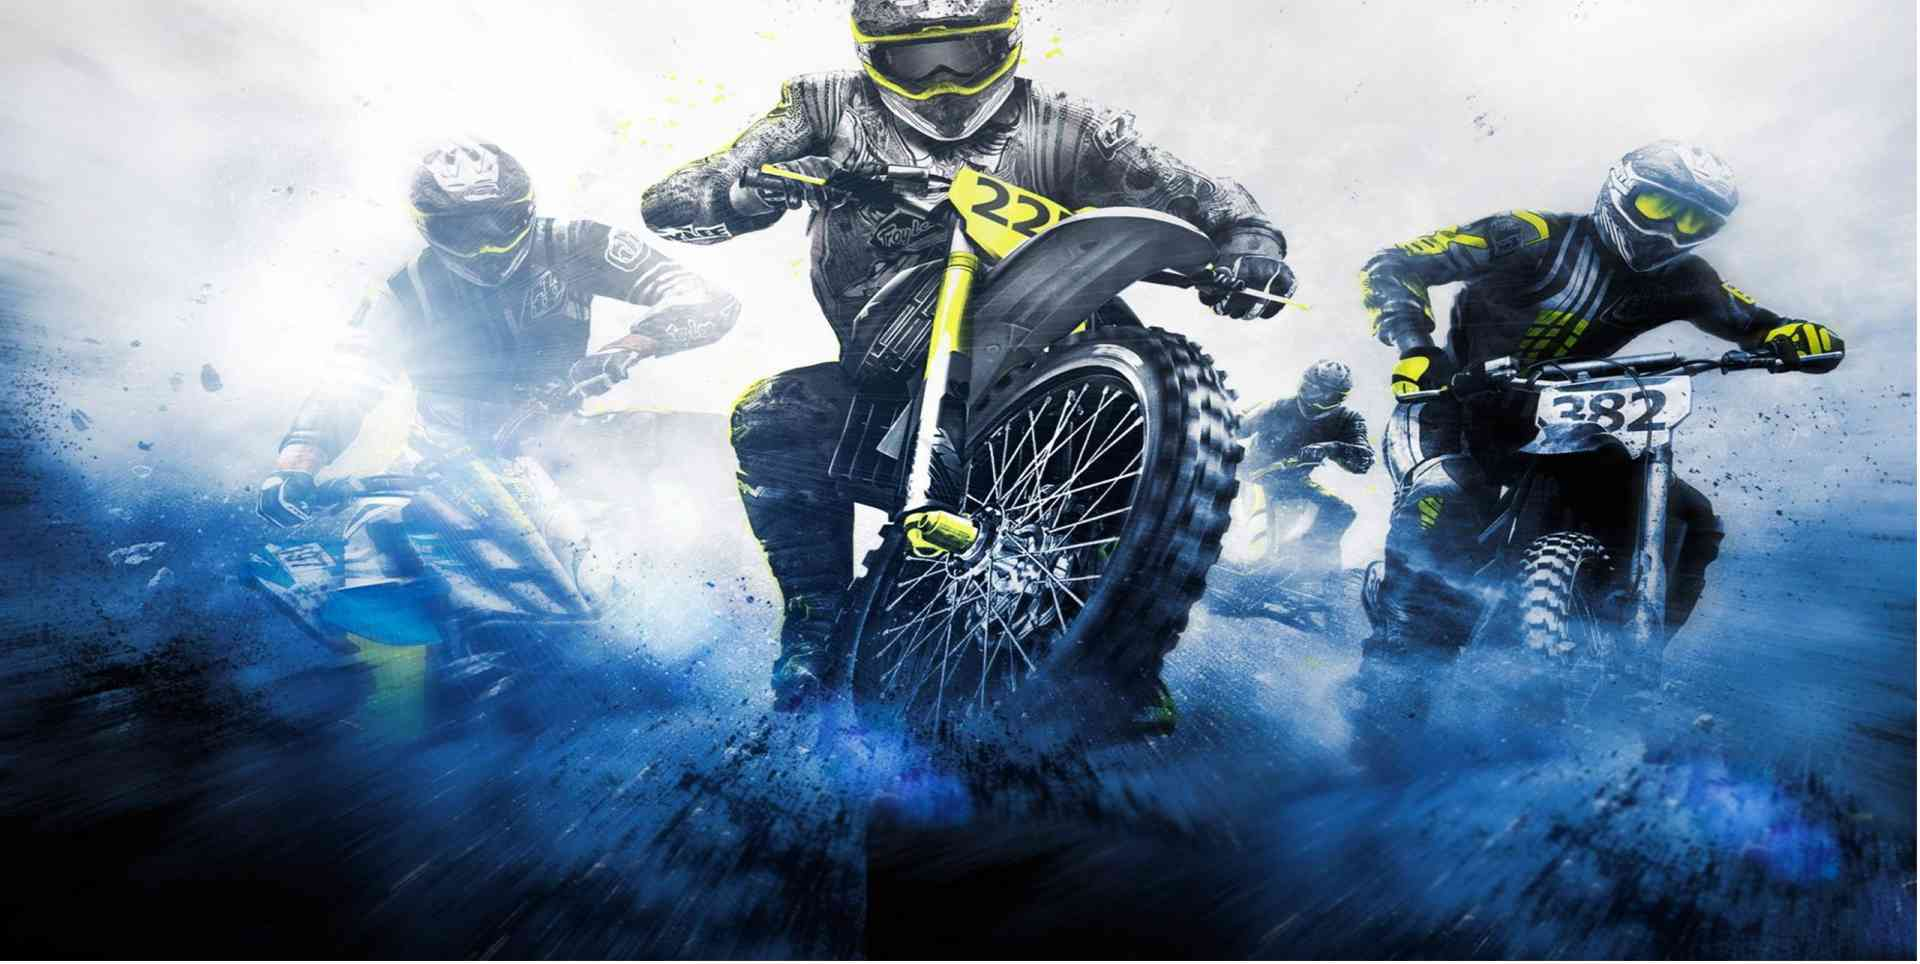 MXGP of Trentino 2020 Live Stream